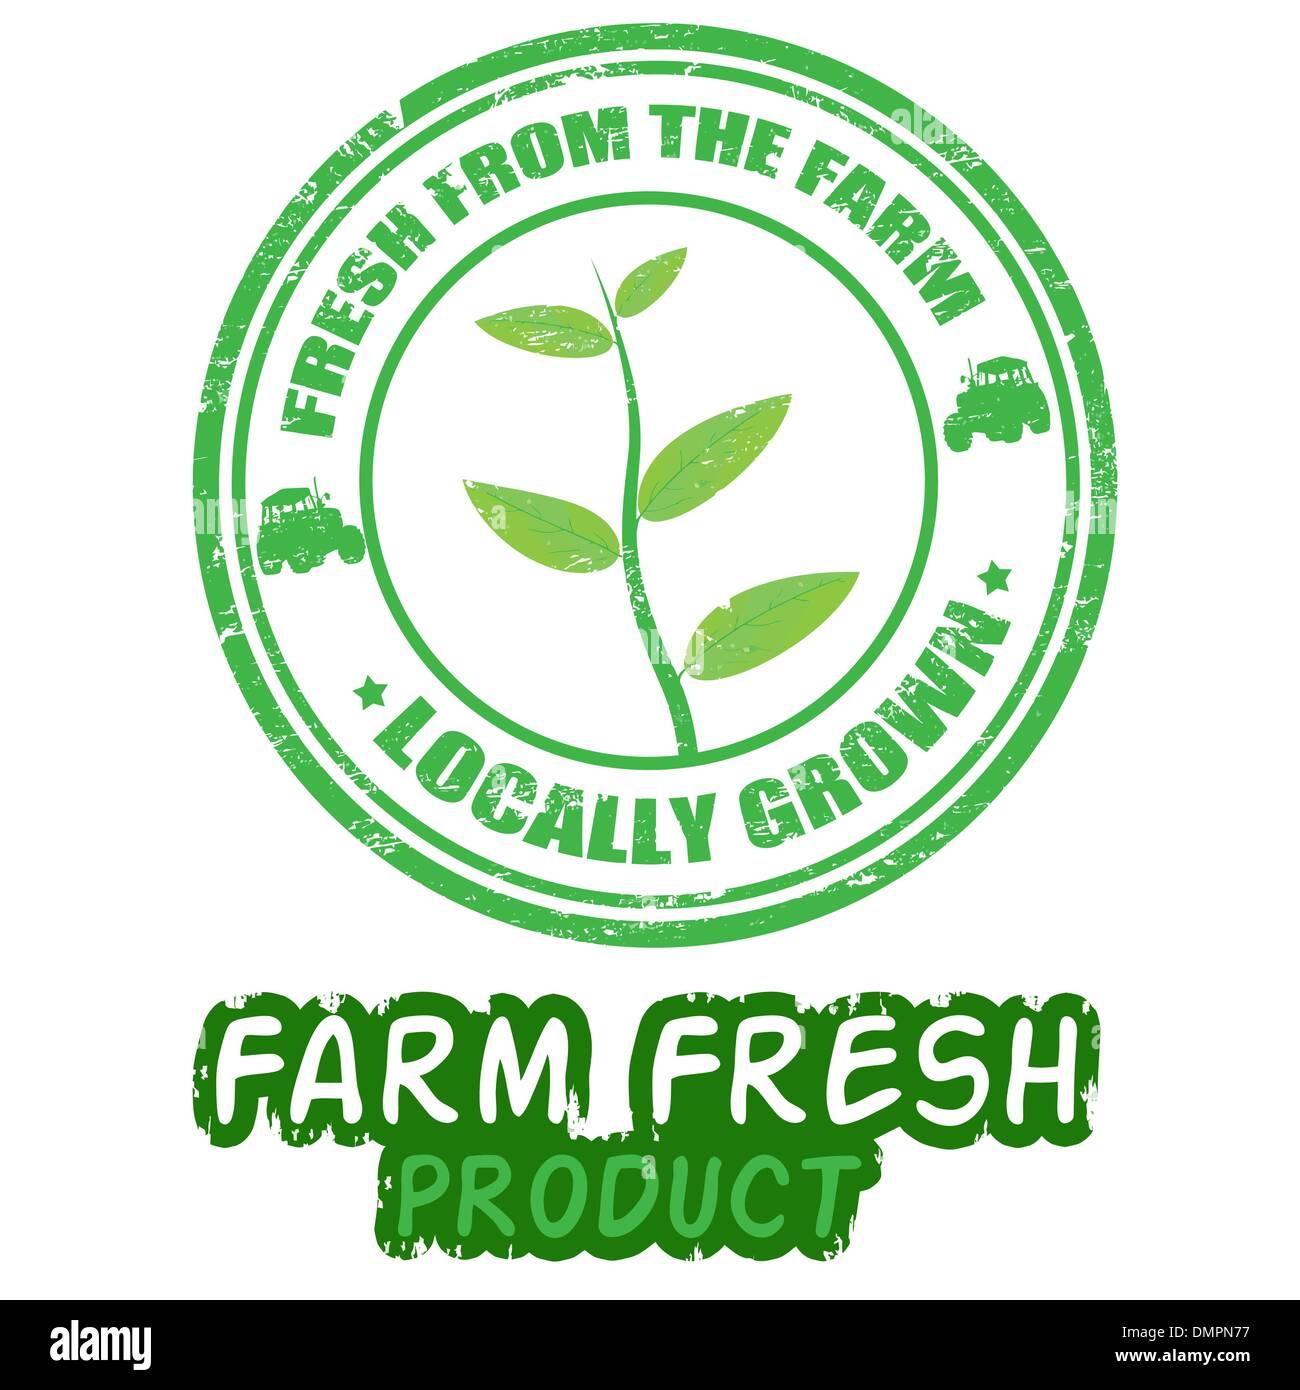 Farm fresh stamps - Stock Vector